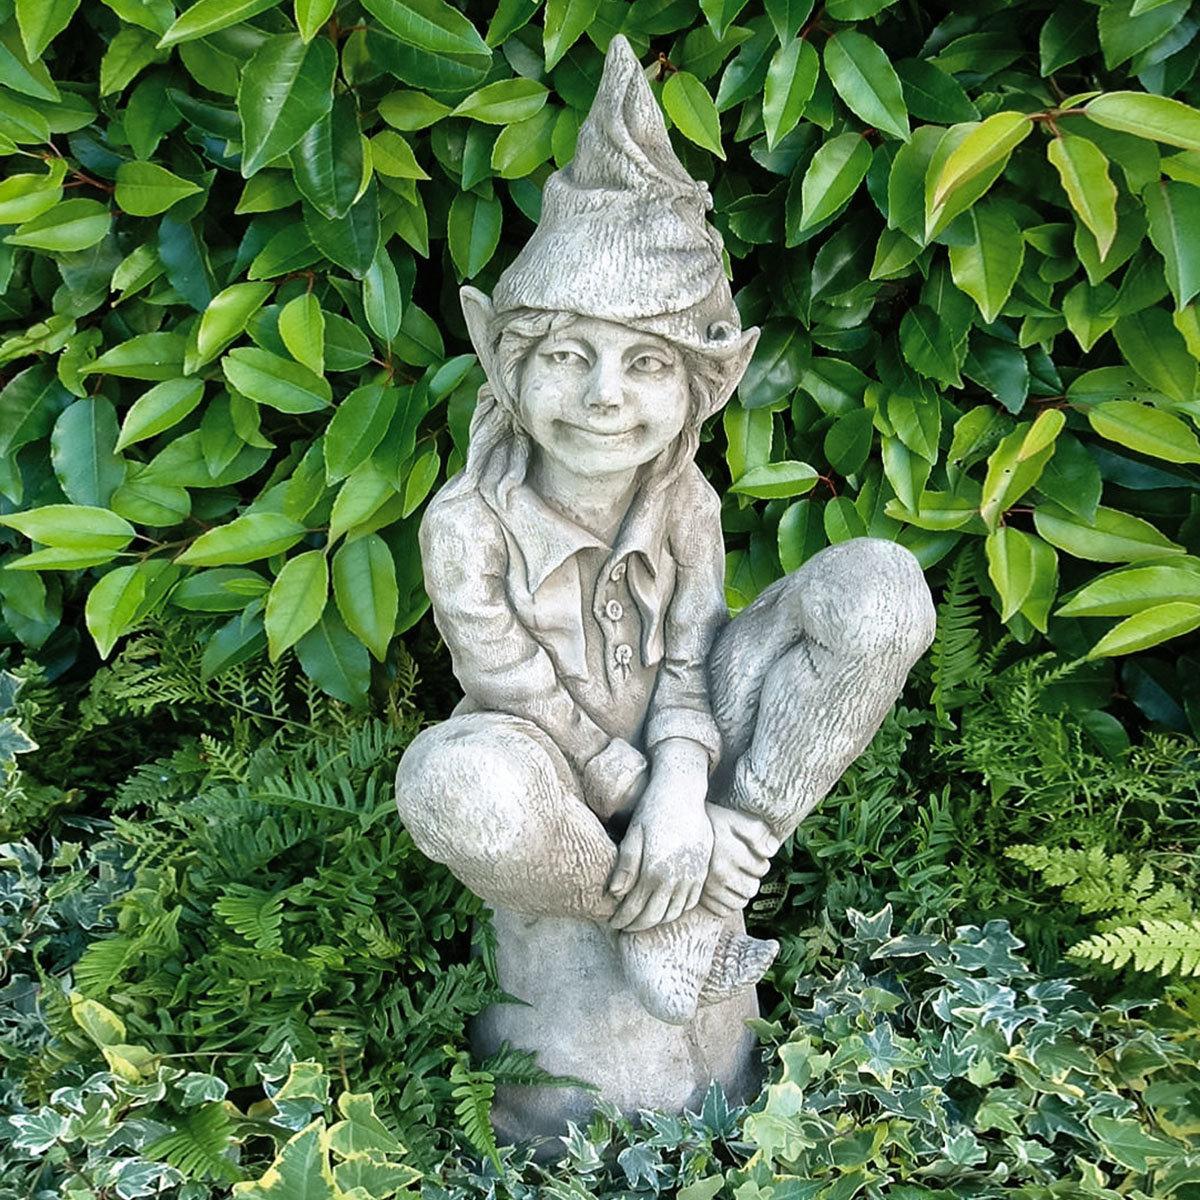 Gartenfigur Elfe Avalo